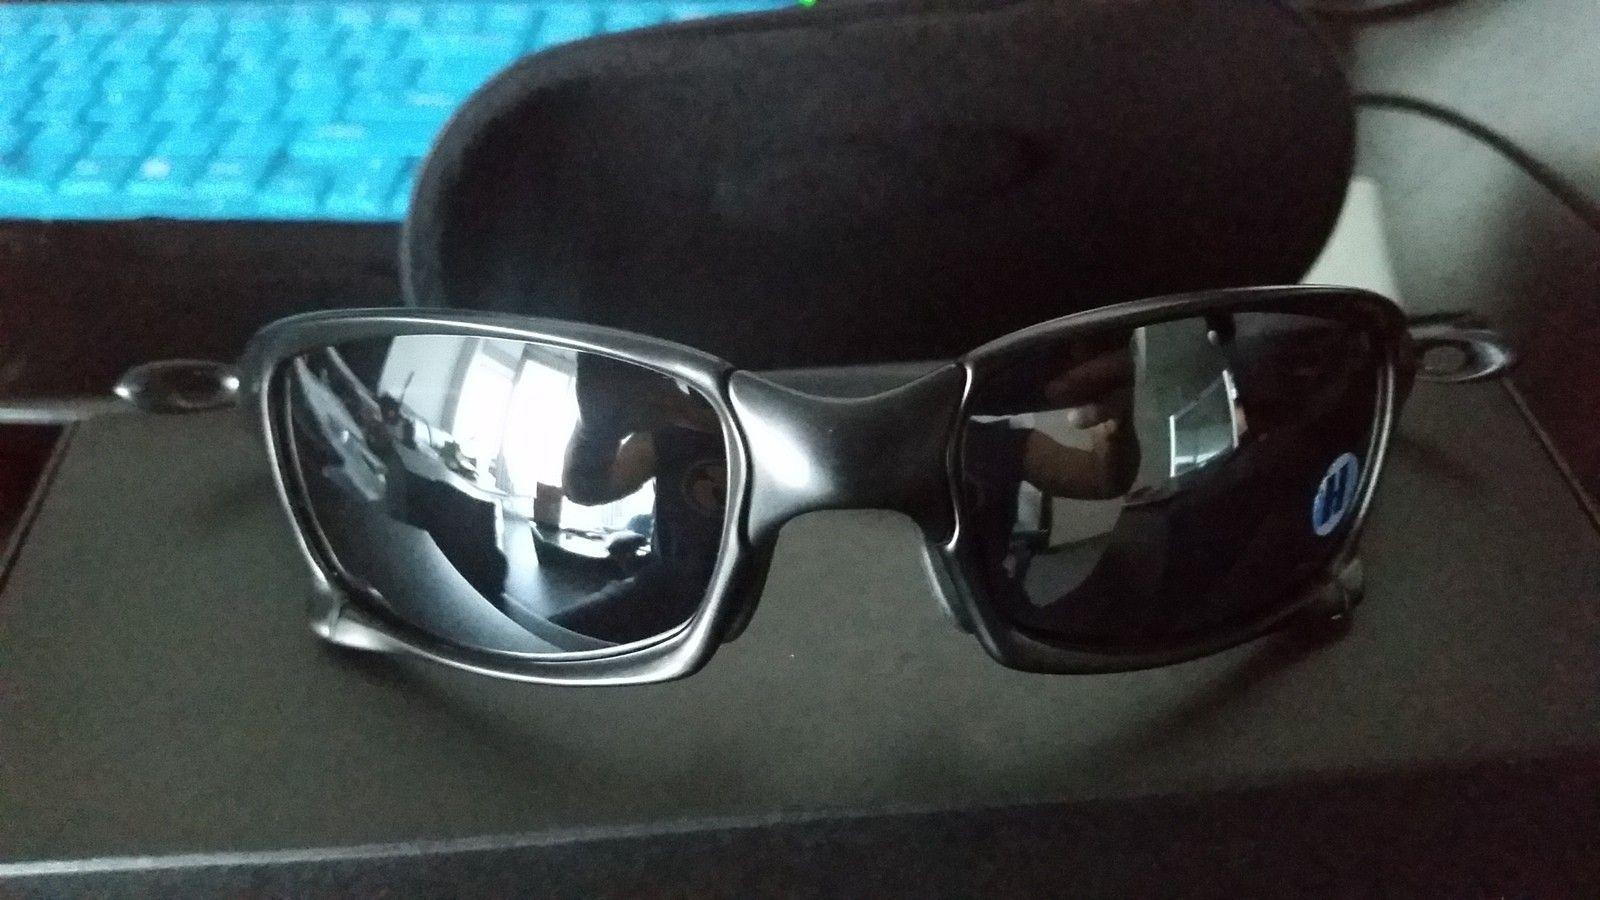 BNIB XS carbon with BI lenses - SKU 6011-01 - 20151012_175649.jpg